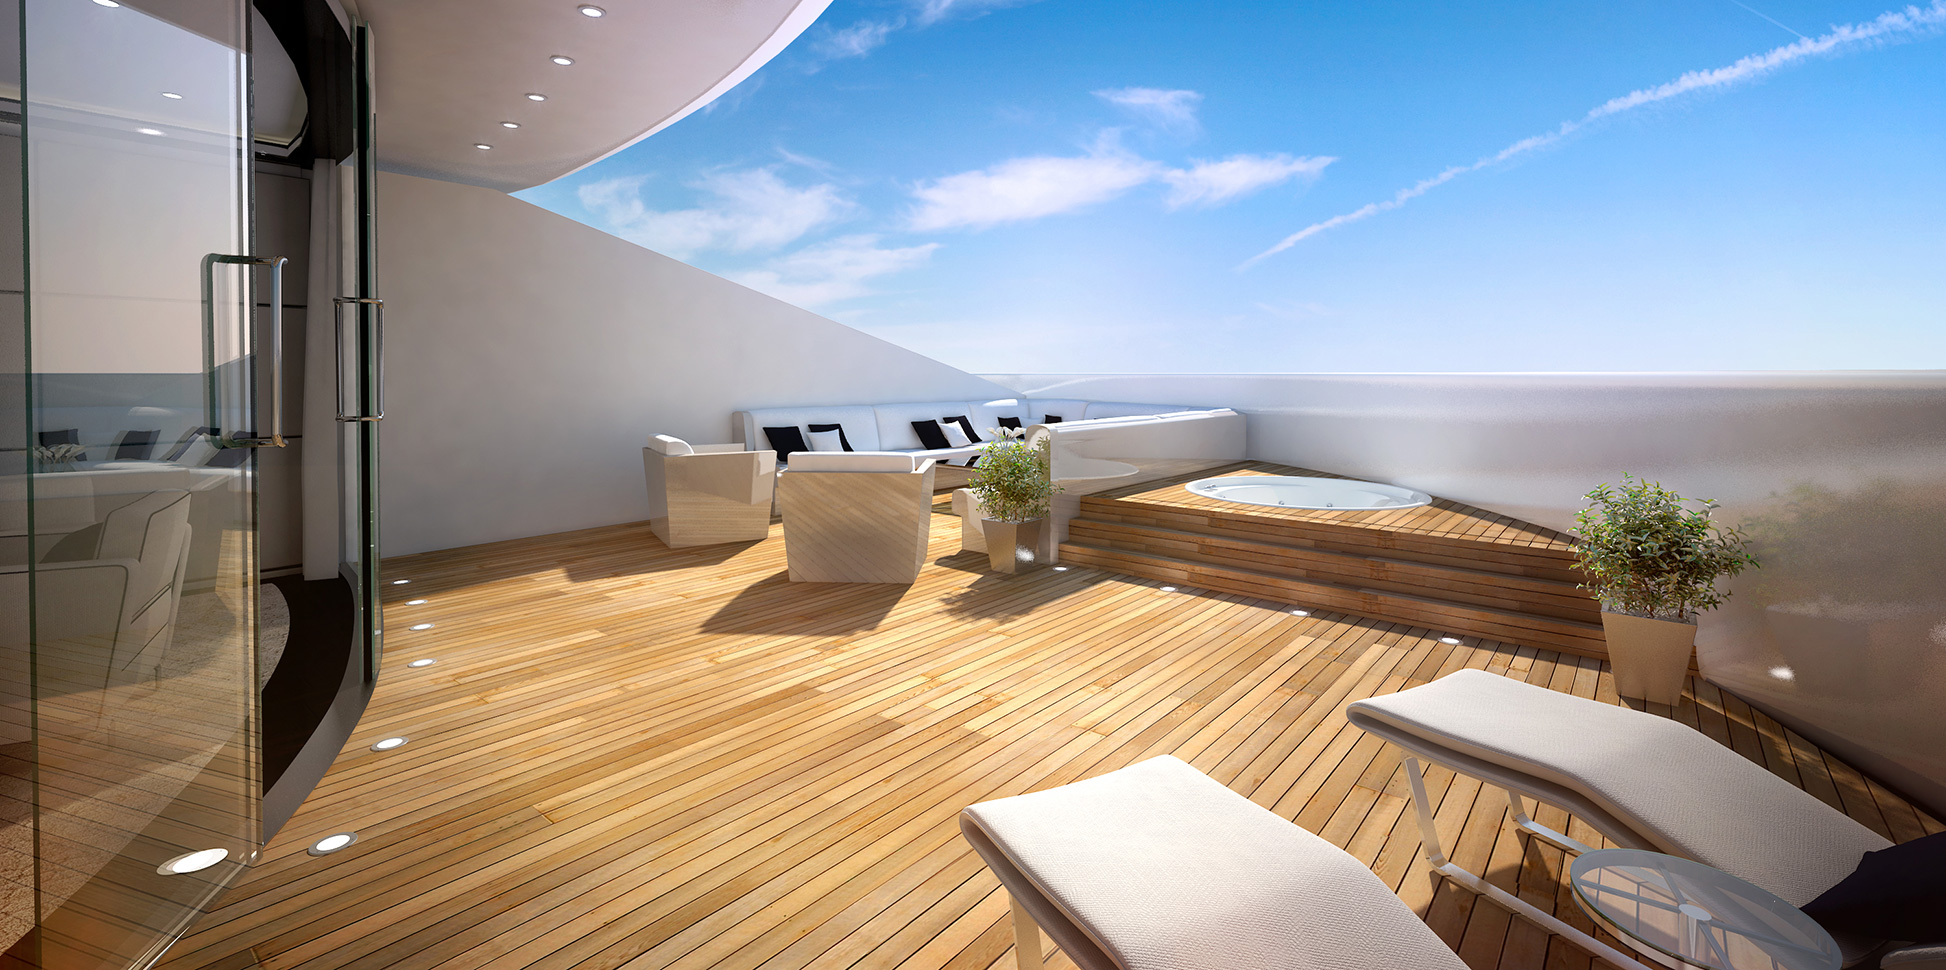 Hotel suites gibraltar 5 star hotel gibraltar sunborn yacht hotel sunborn gibraltar for 5 star restaurant exterior